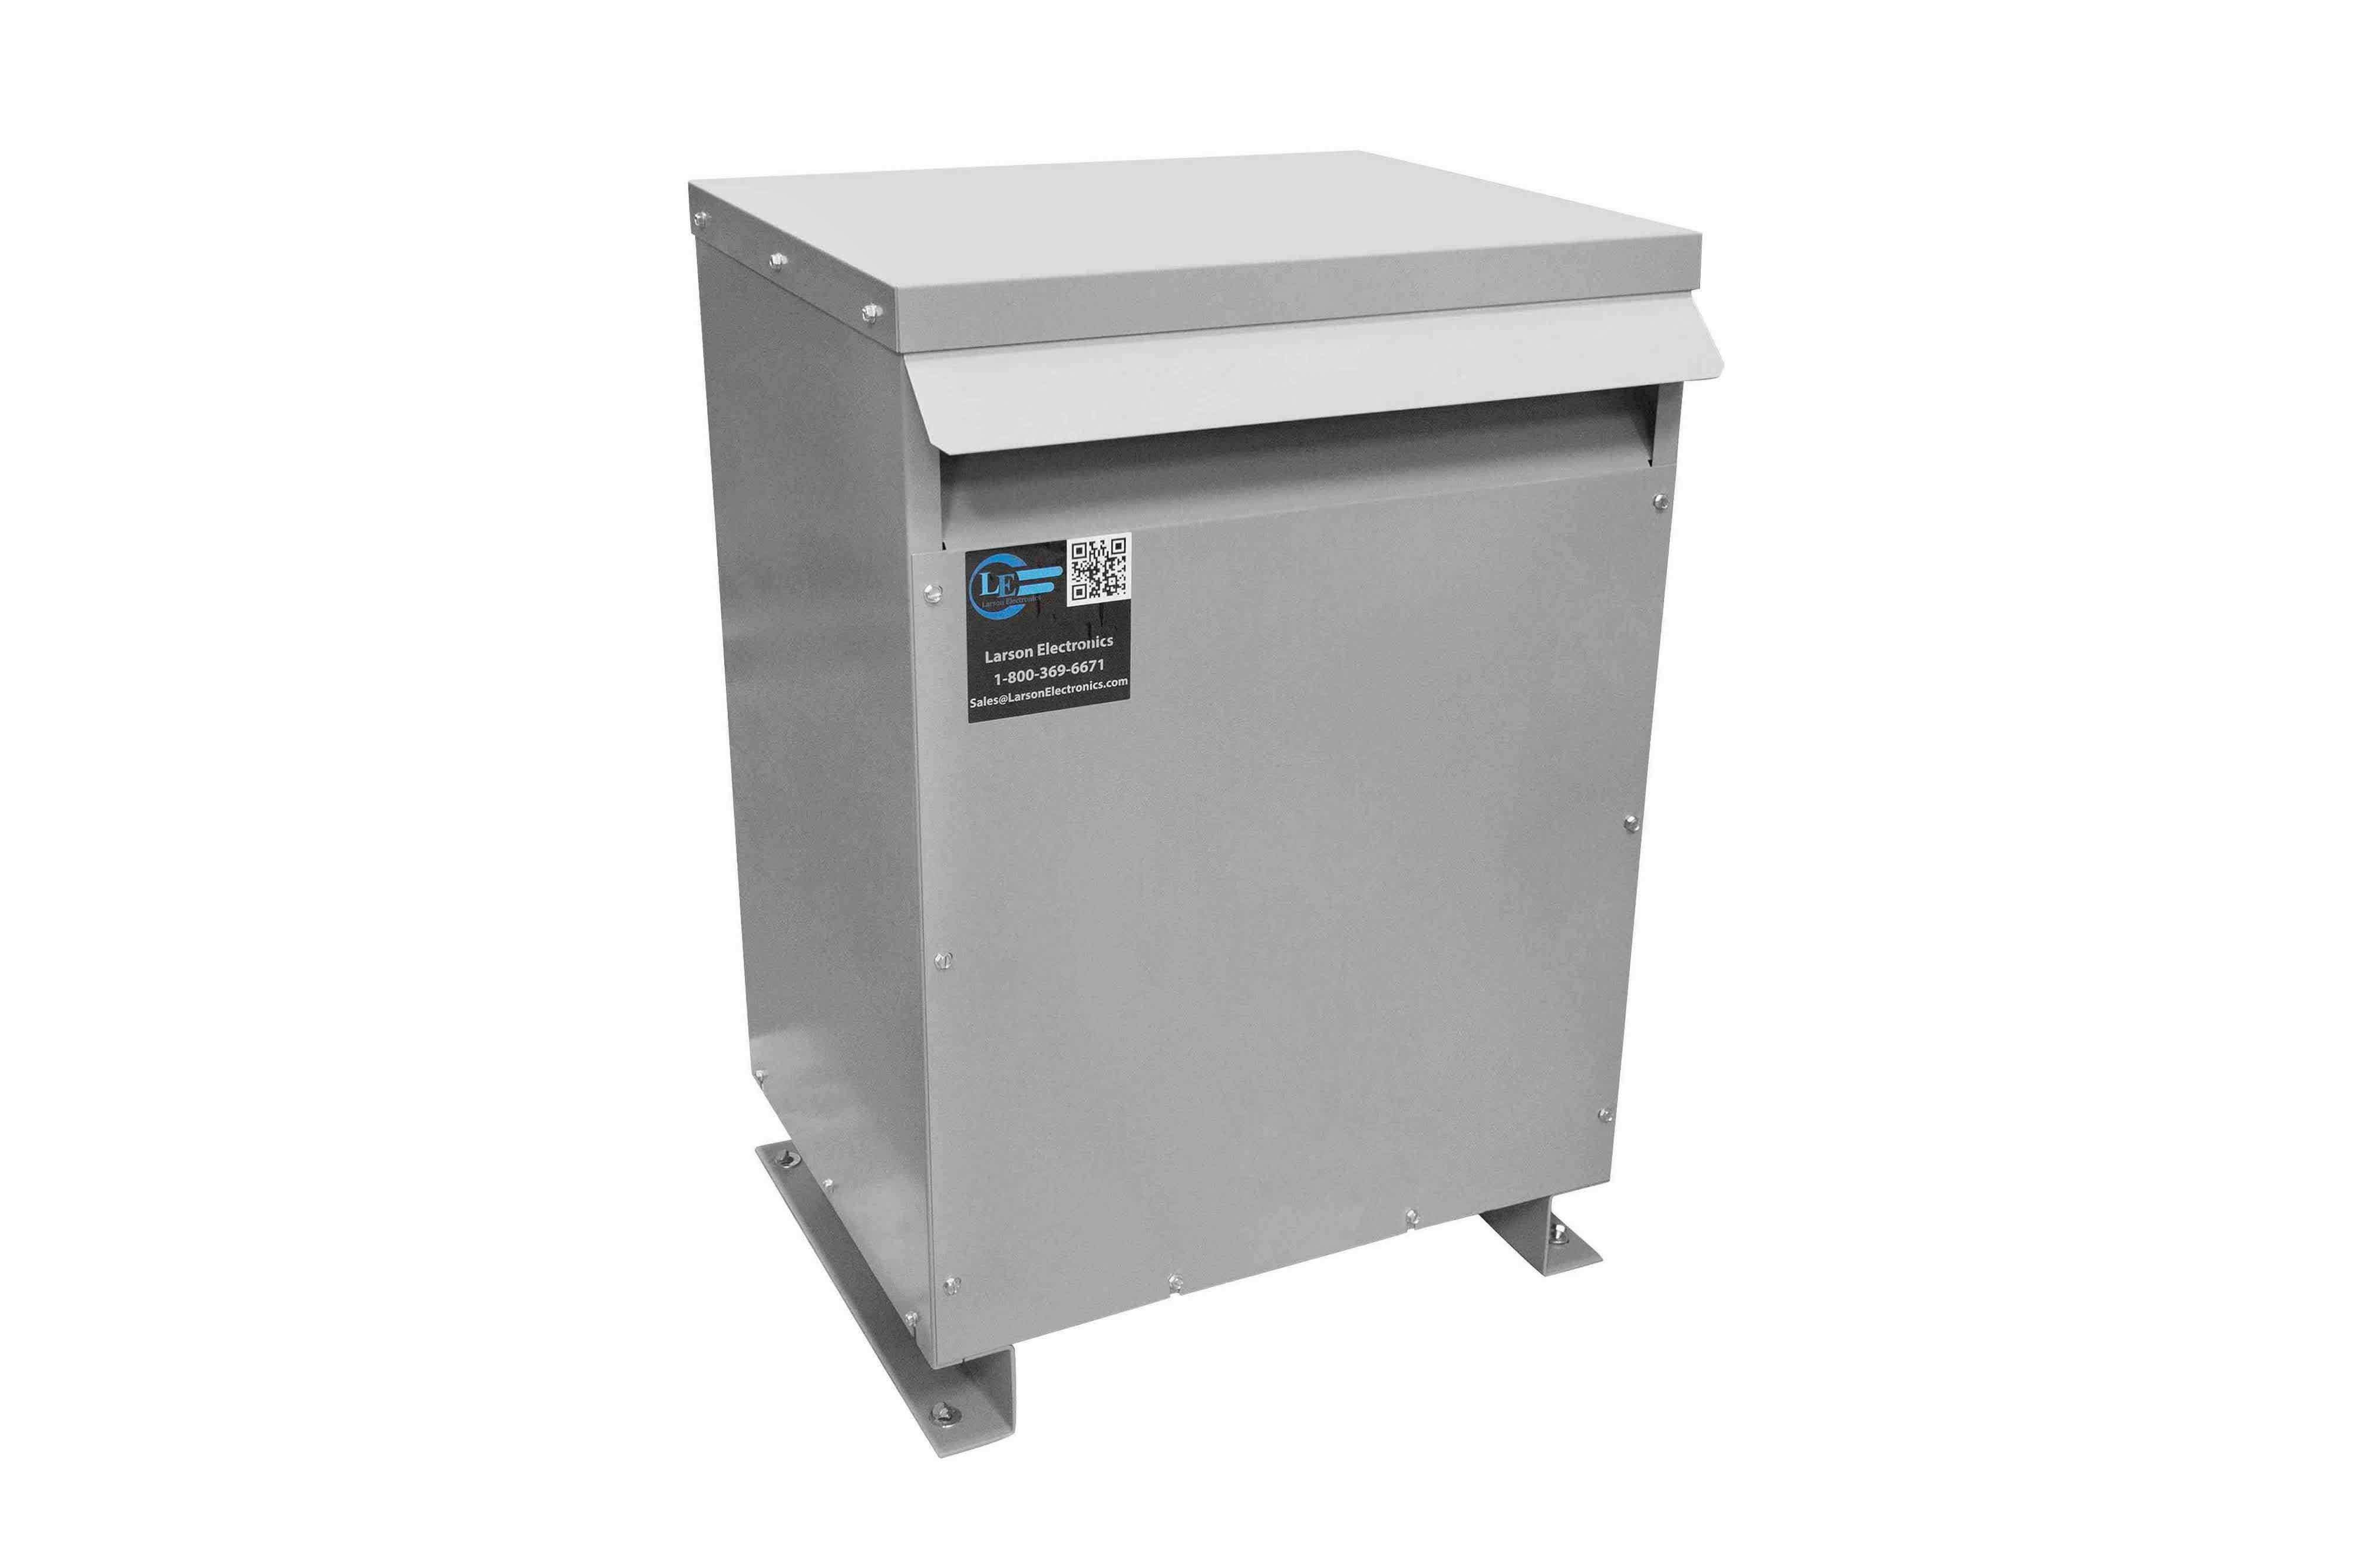 80 kVA 3PH Isolation Transformer, 400V Wye Primary, 480Y/277 Wye-N Secondary, N3R, Ventilated, 60 Hz